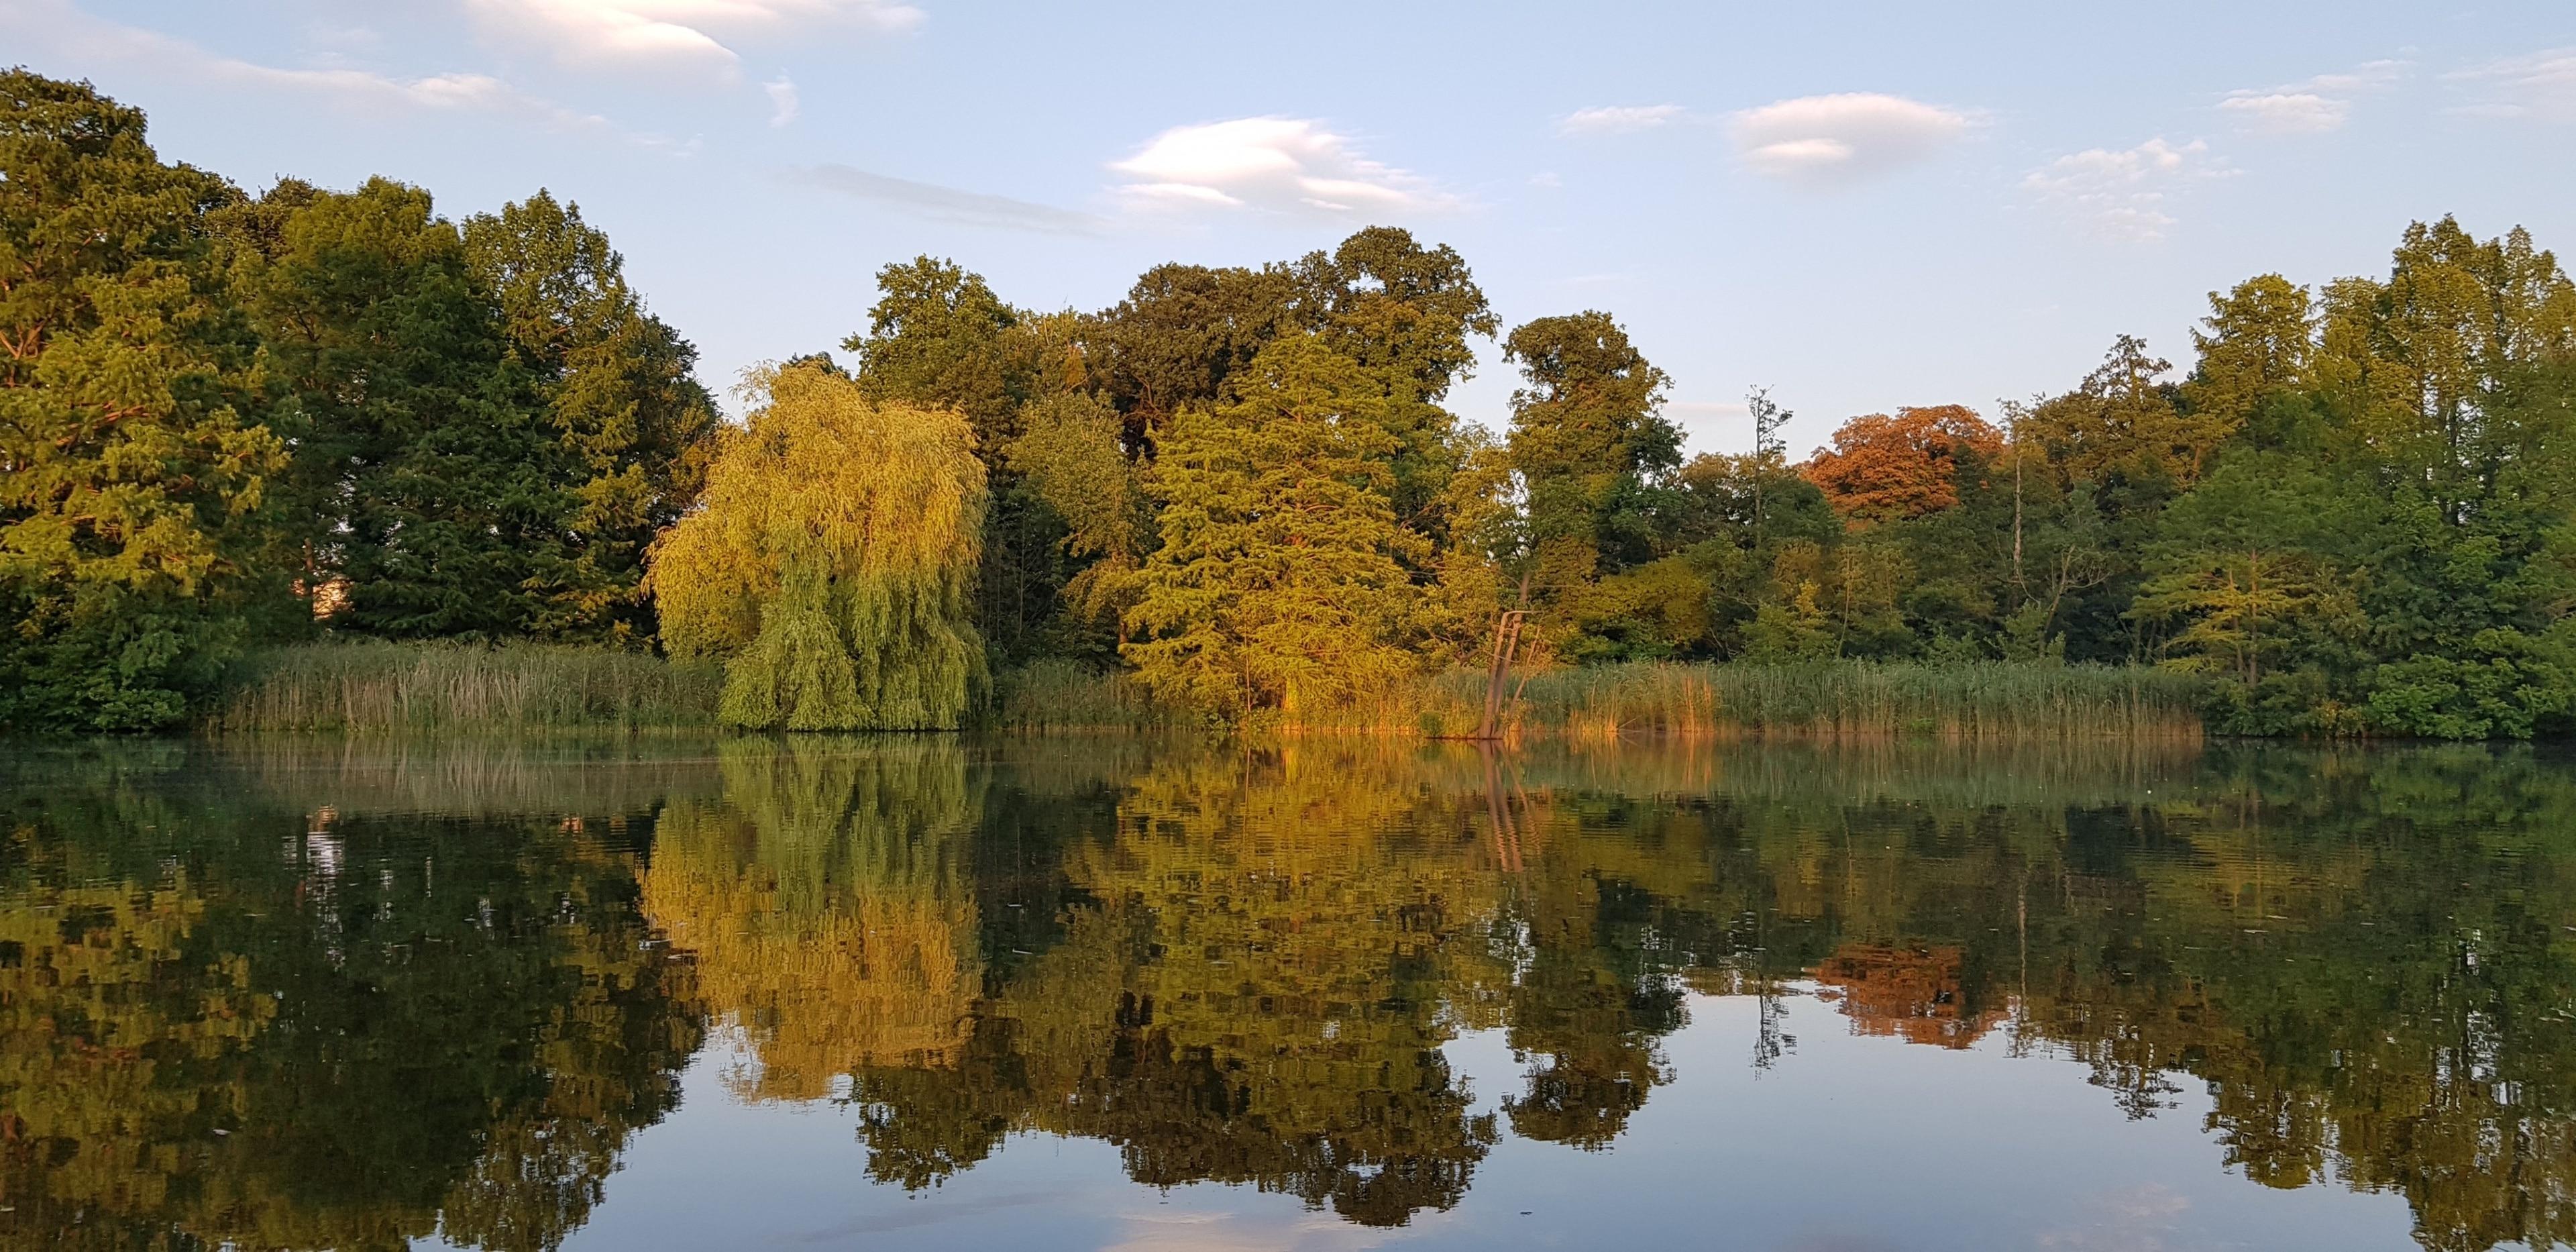 Schloss Charlottenhof, Potsdam, Brandenburg Region, Deutschland